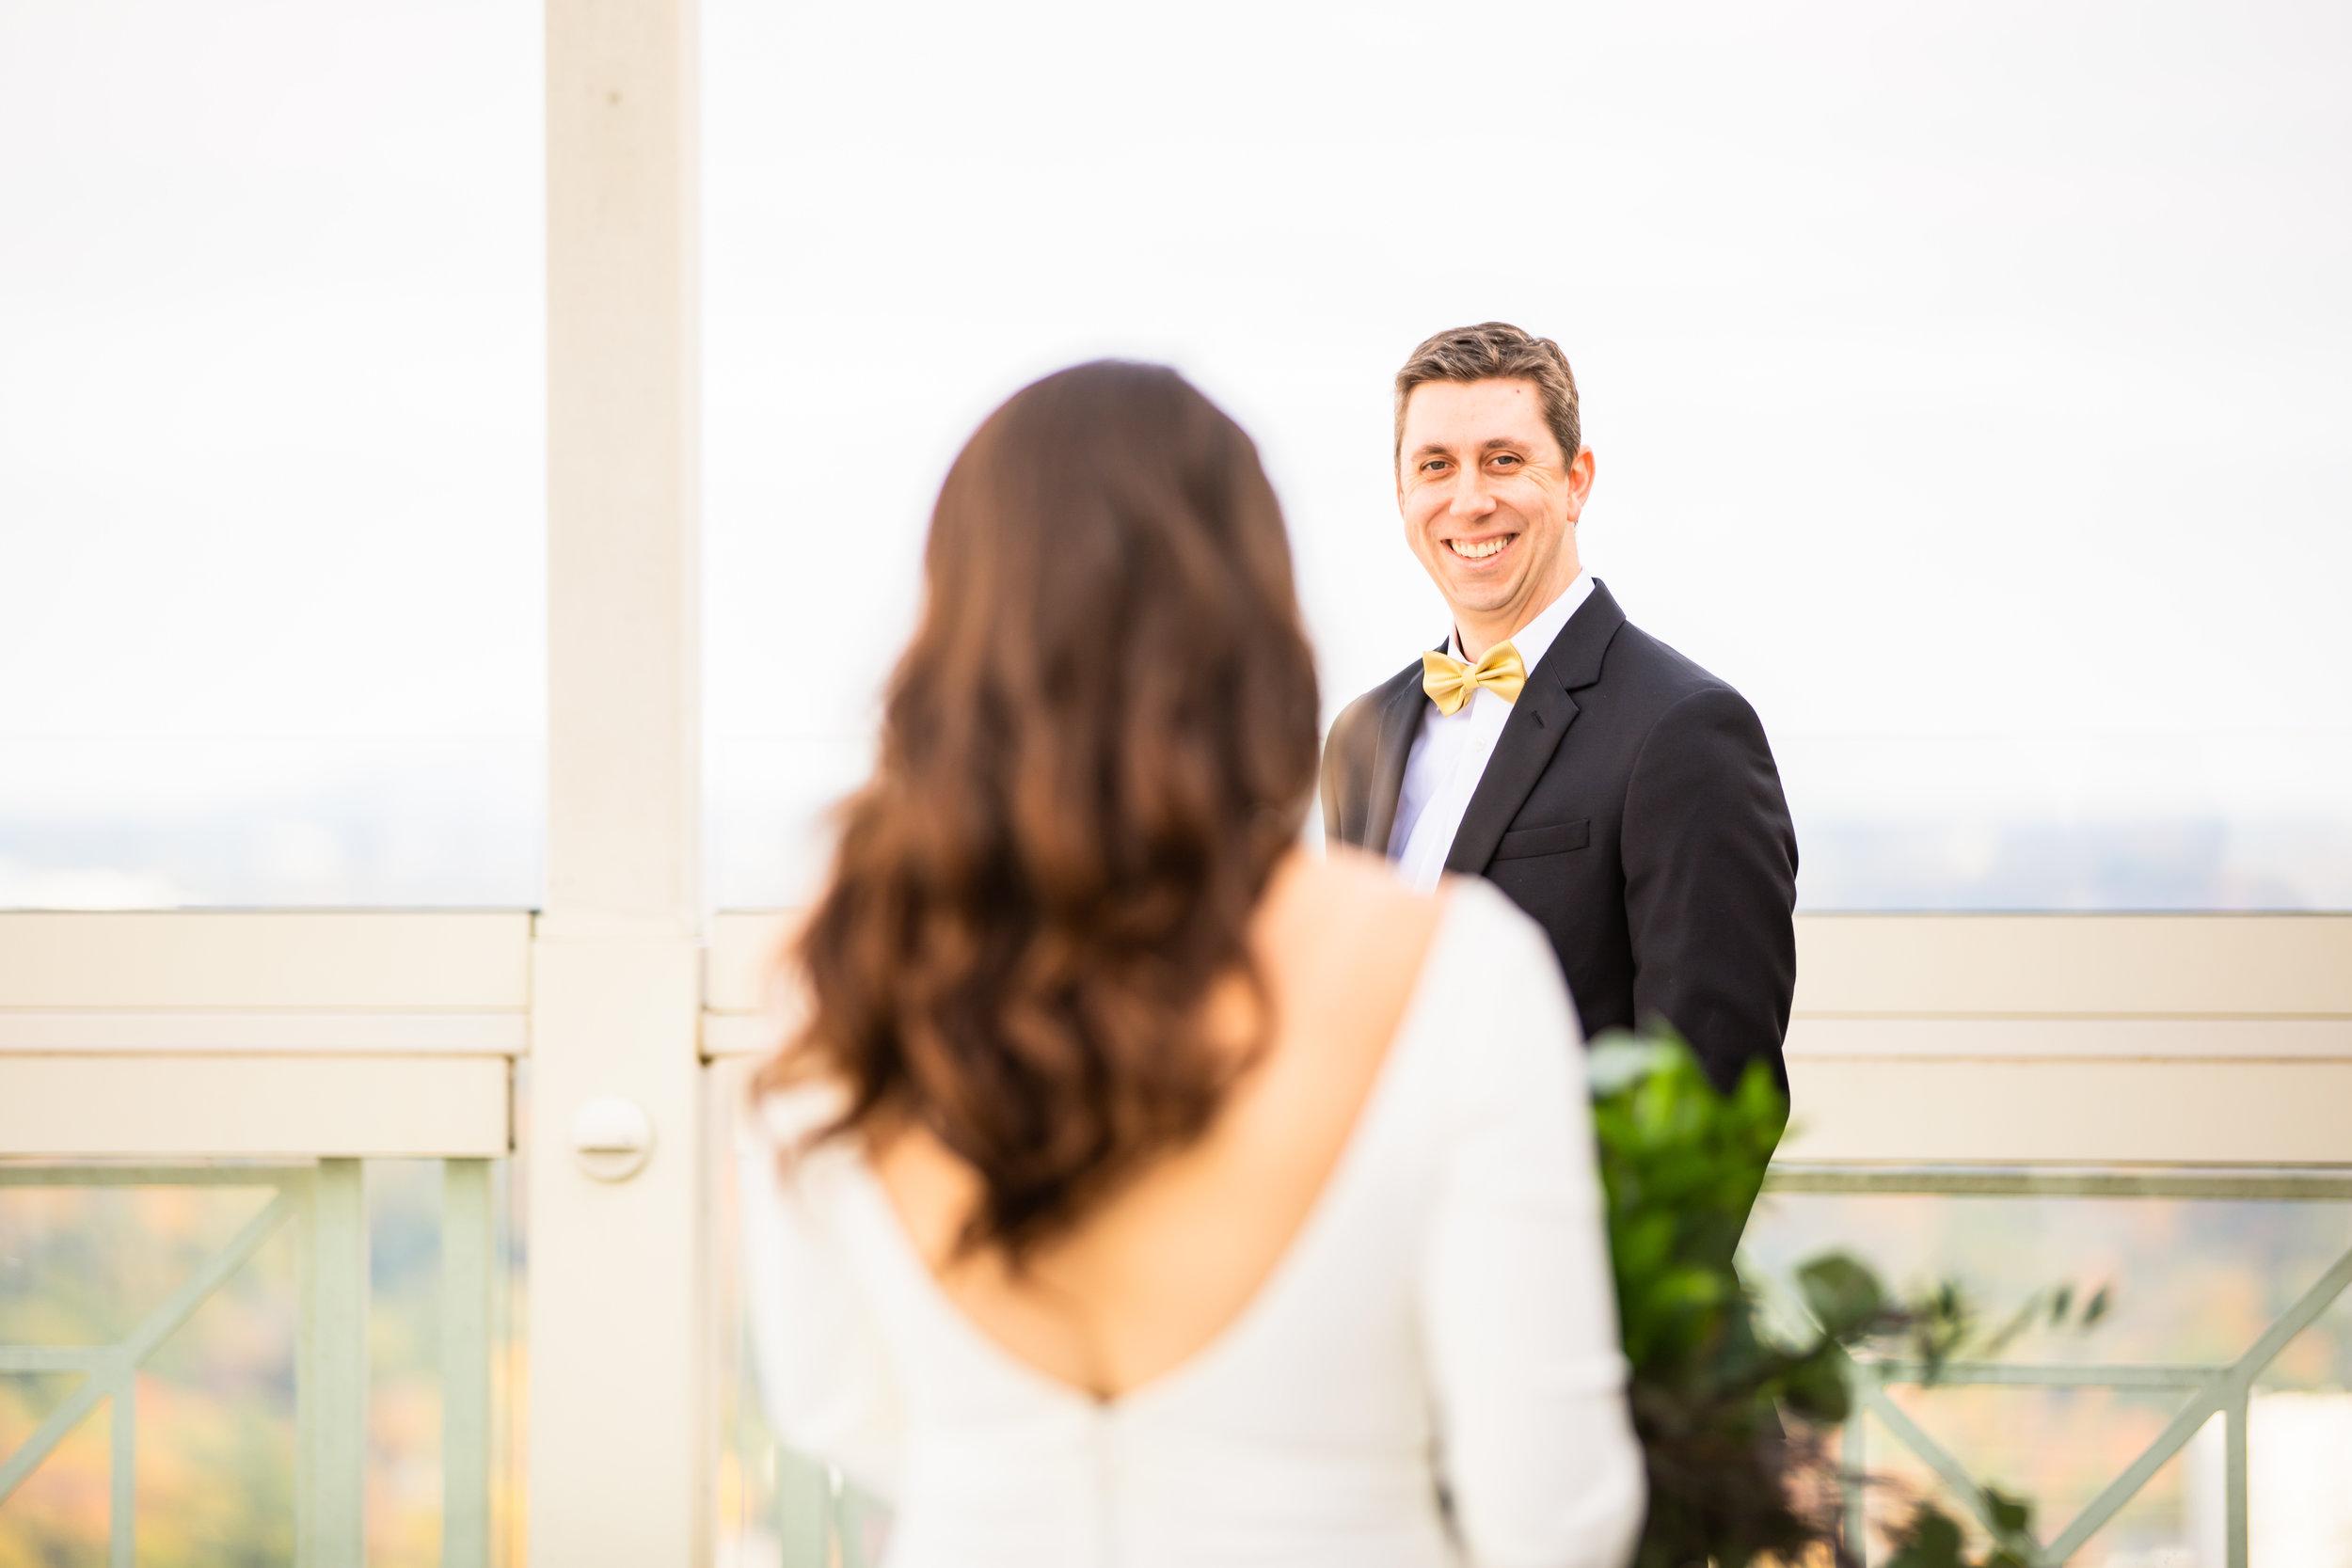 Wedding_Atlanta_Emily_Lester_Photography-1034.jpg